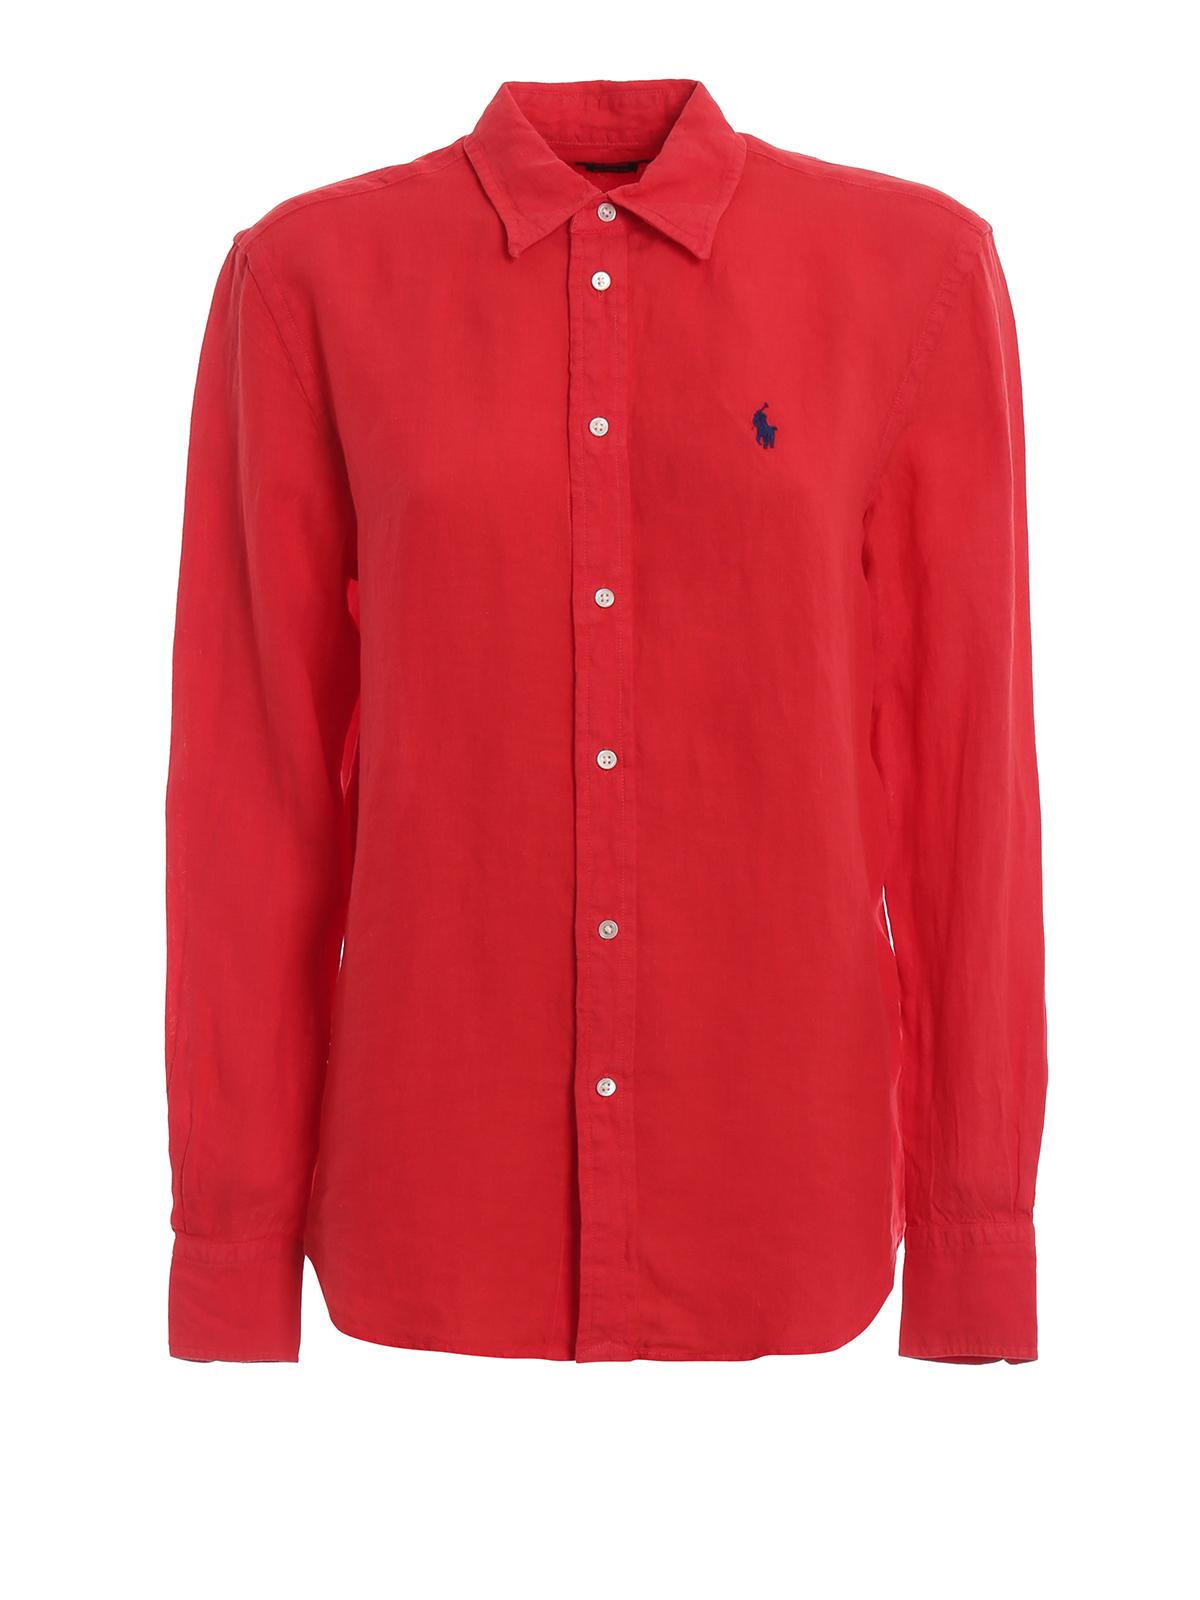 polo ralph lauren hemd rot hemden 211732637002. Black Bedroom Furniture Sets. Home Design Ideas